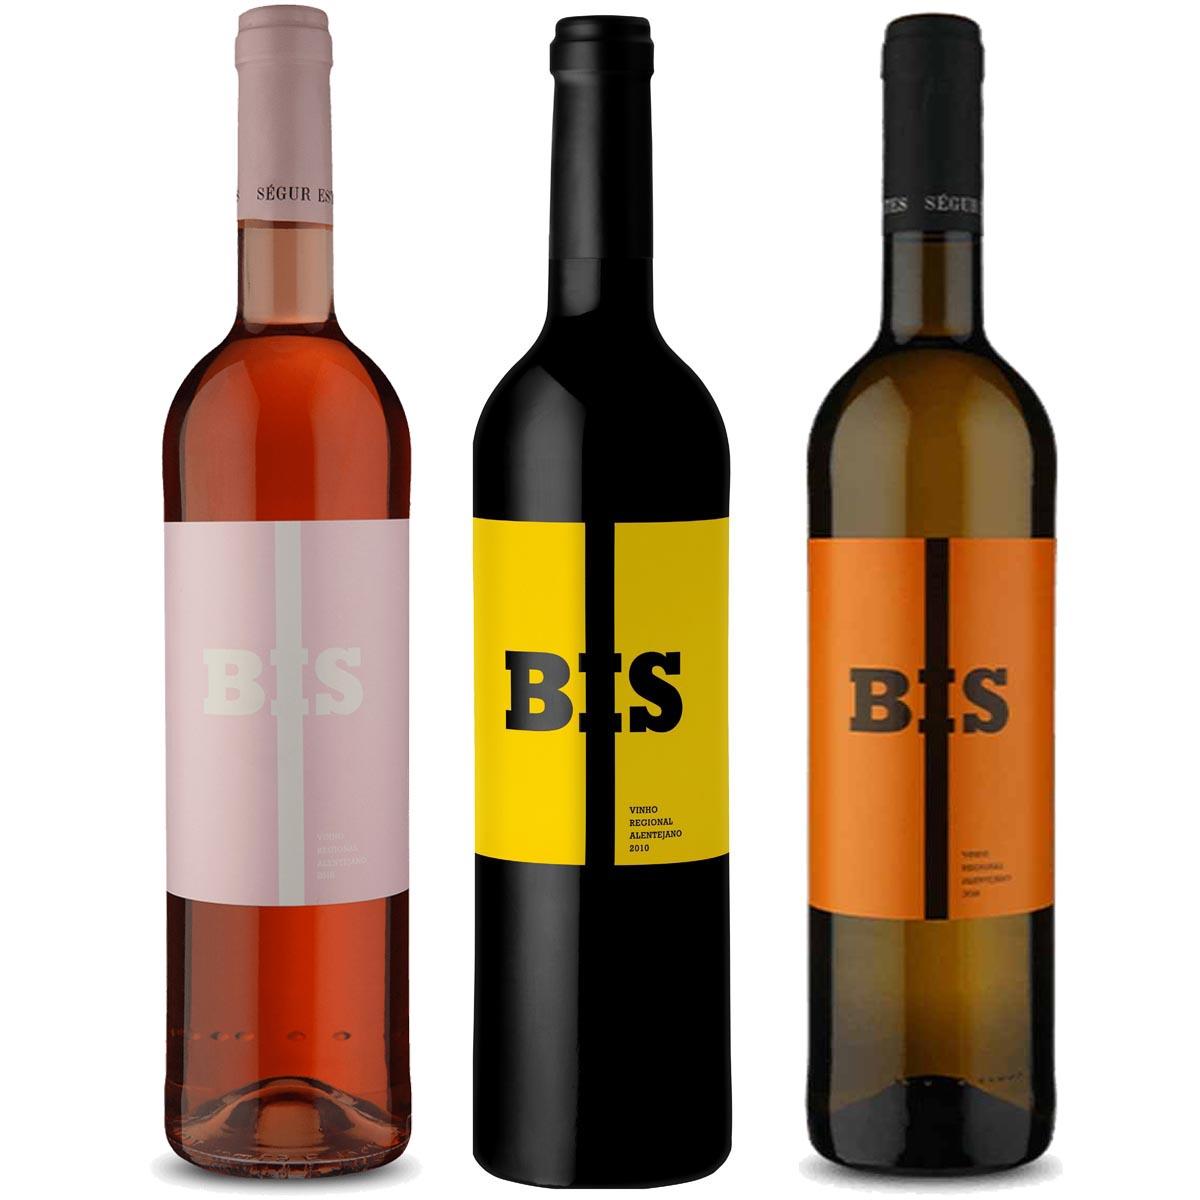 Kit 3 Vinhos Bis Portugueses Branco, Tinto e Rosé 2018